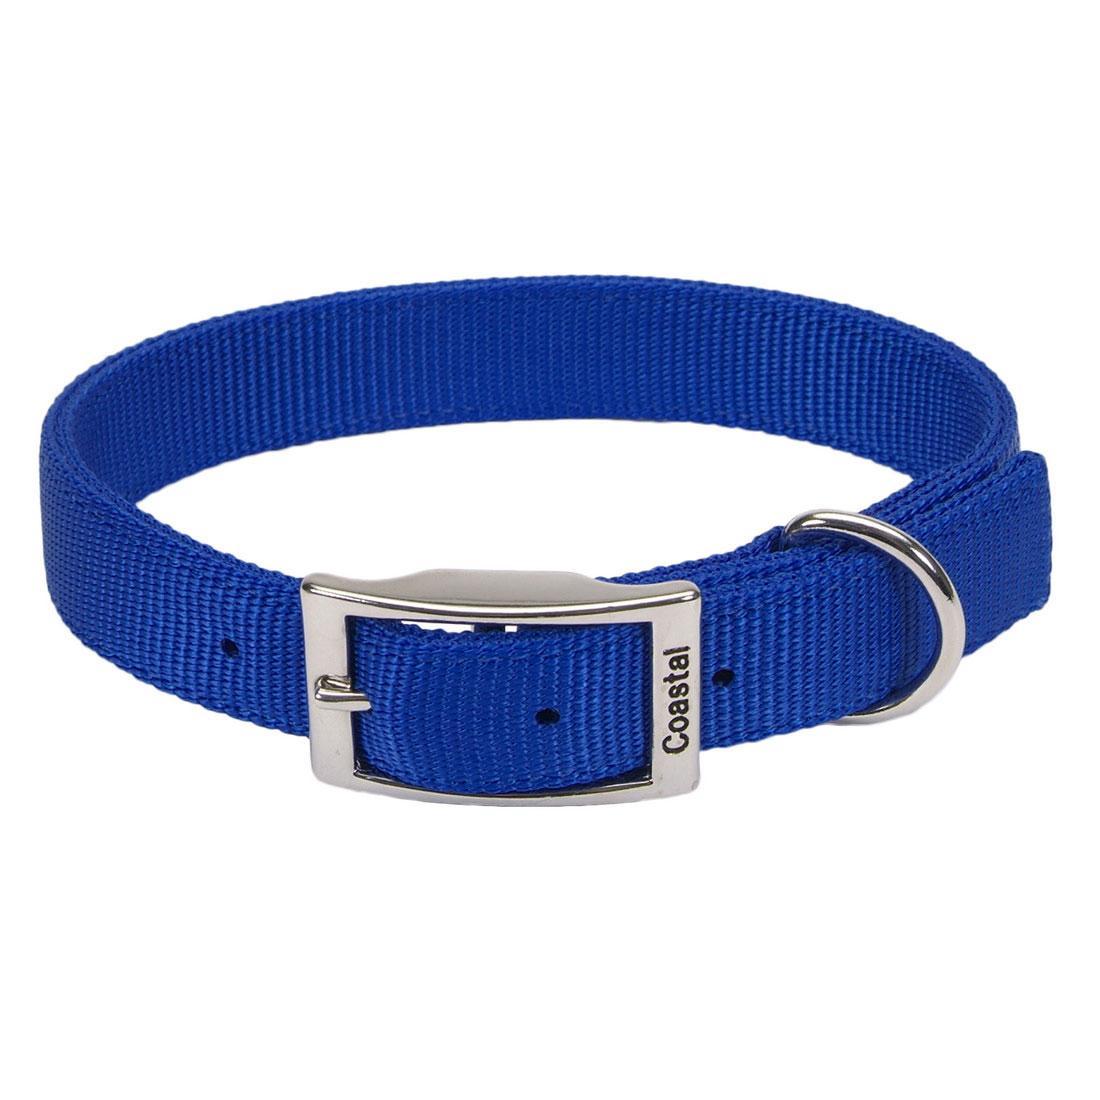 Coastal Double-Ply Nylon Dog Collar, Blue, 1-in x 22-in